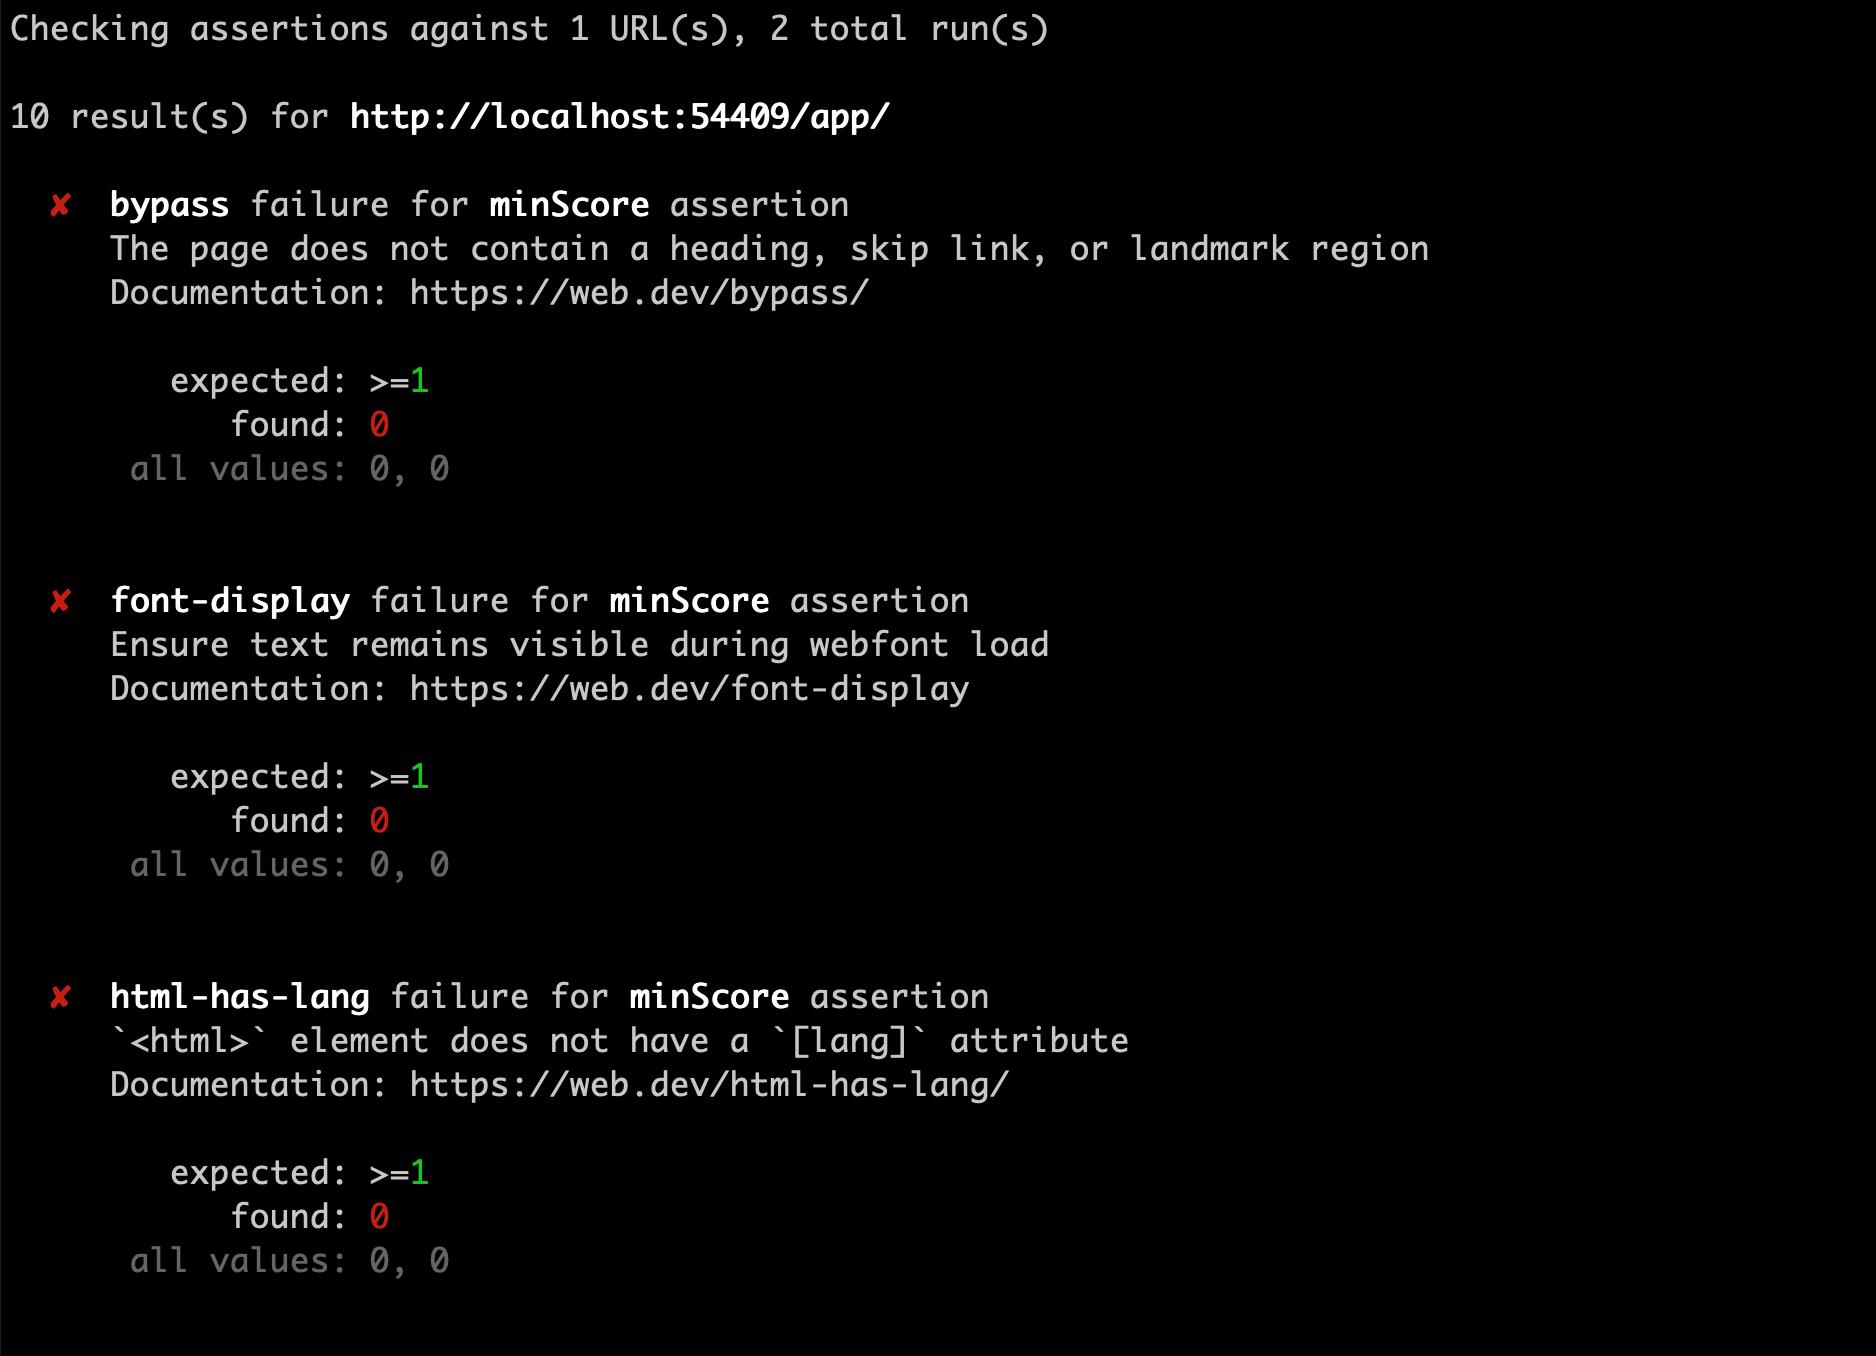 Screenshot of the Lighthouse CI assertion output